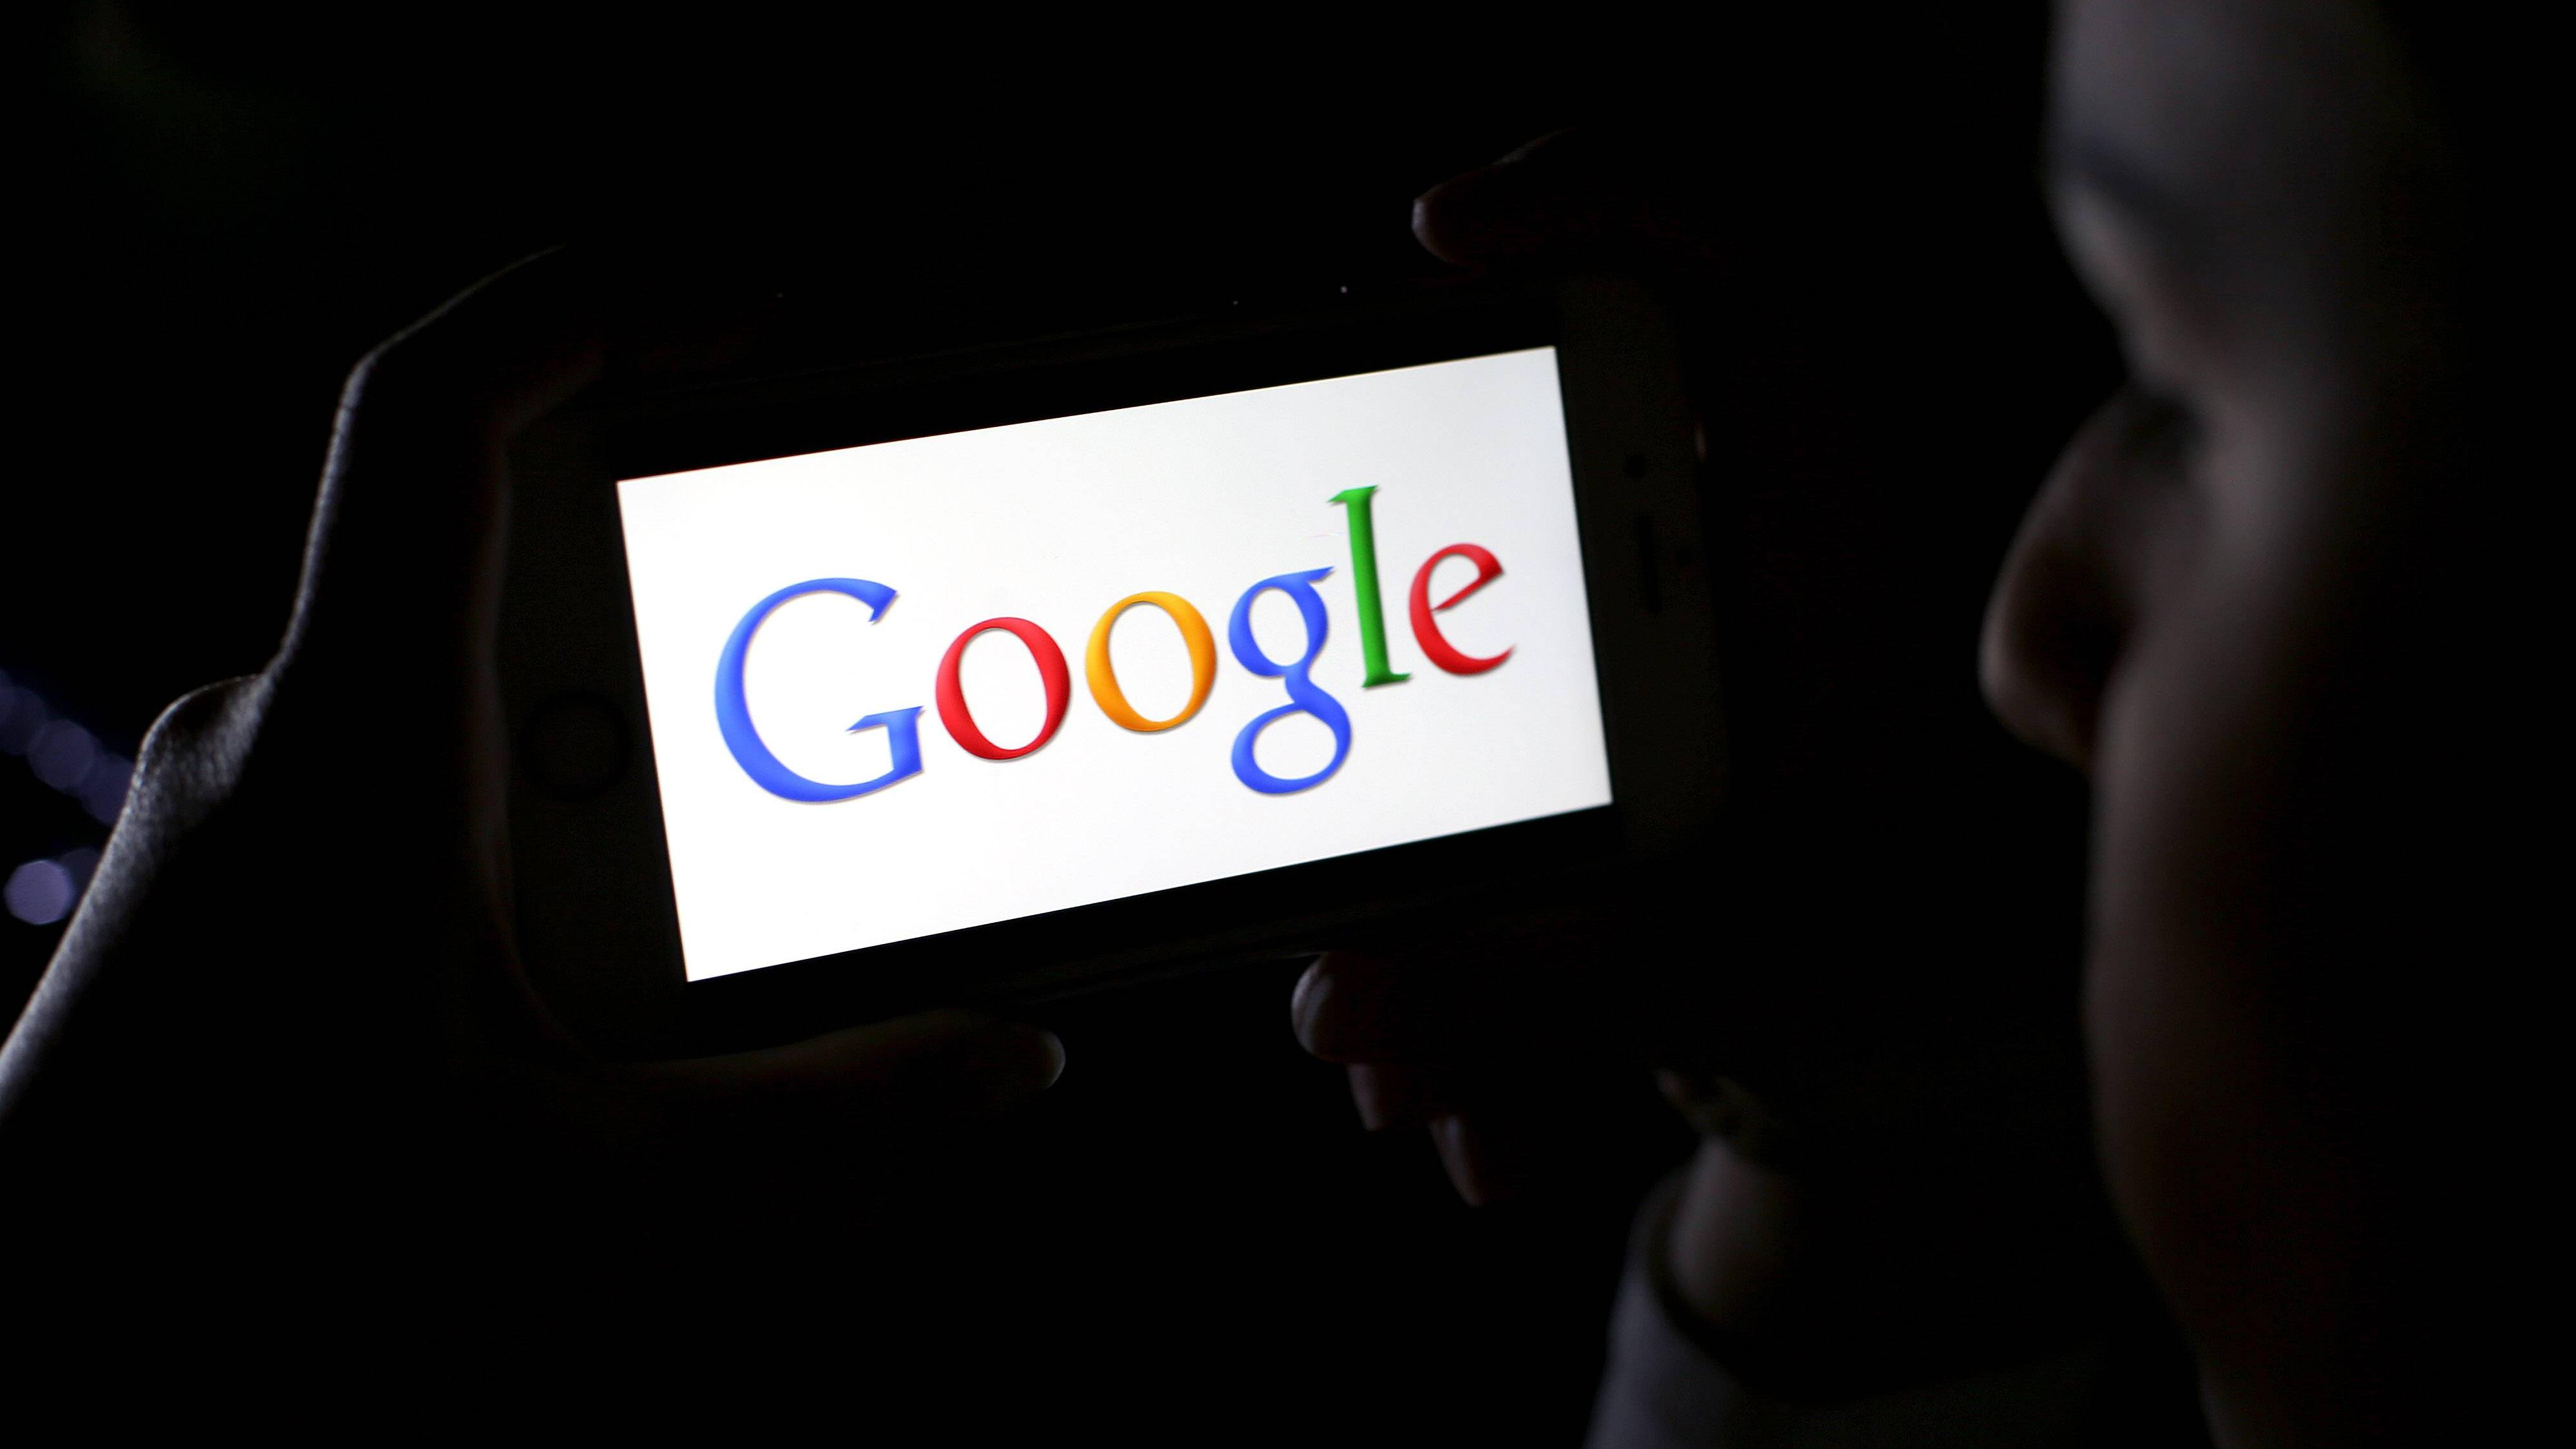 Google Docs: Textfeld einfügen - so geht's